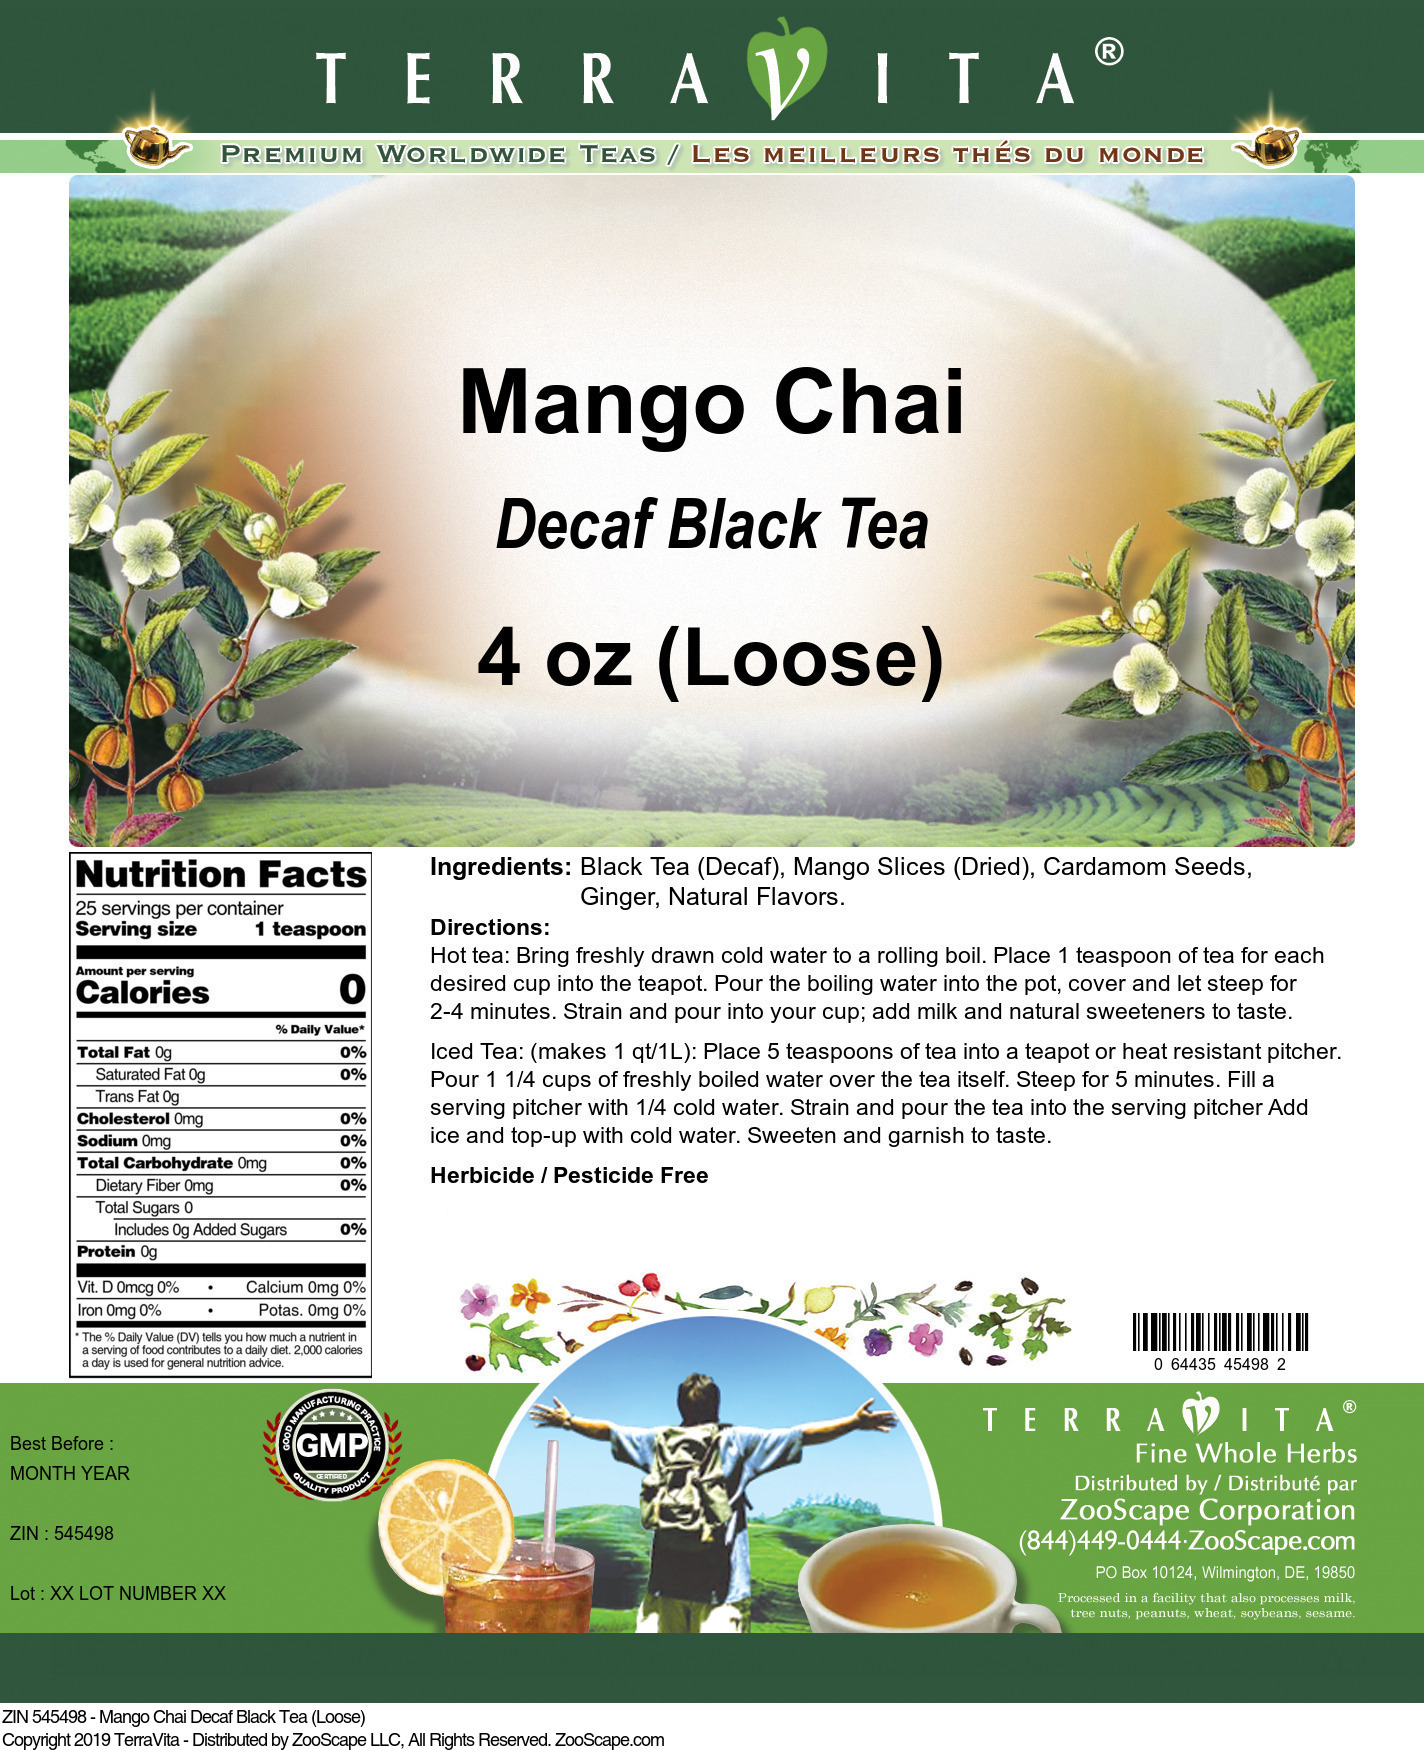 Mango Chai Decaf Black Tea (Loose)